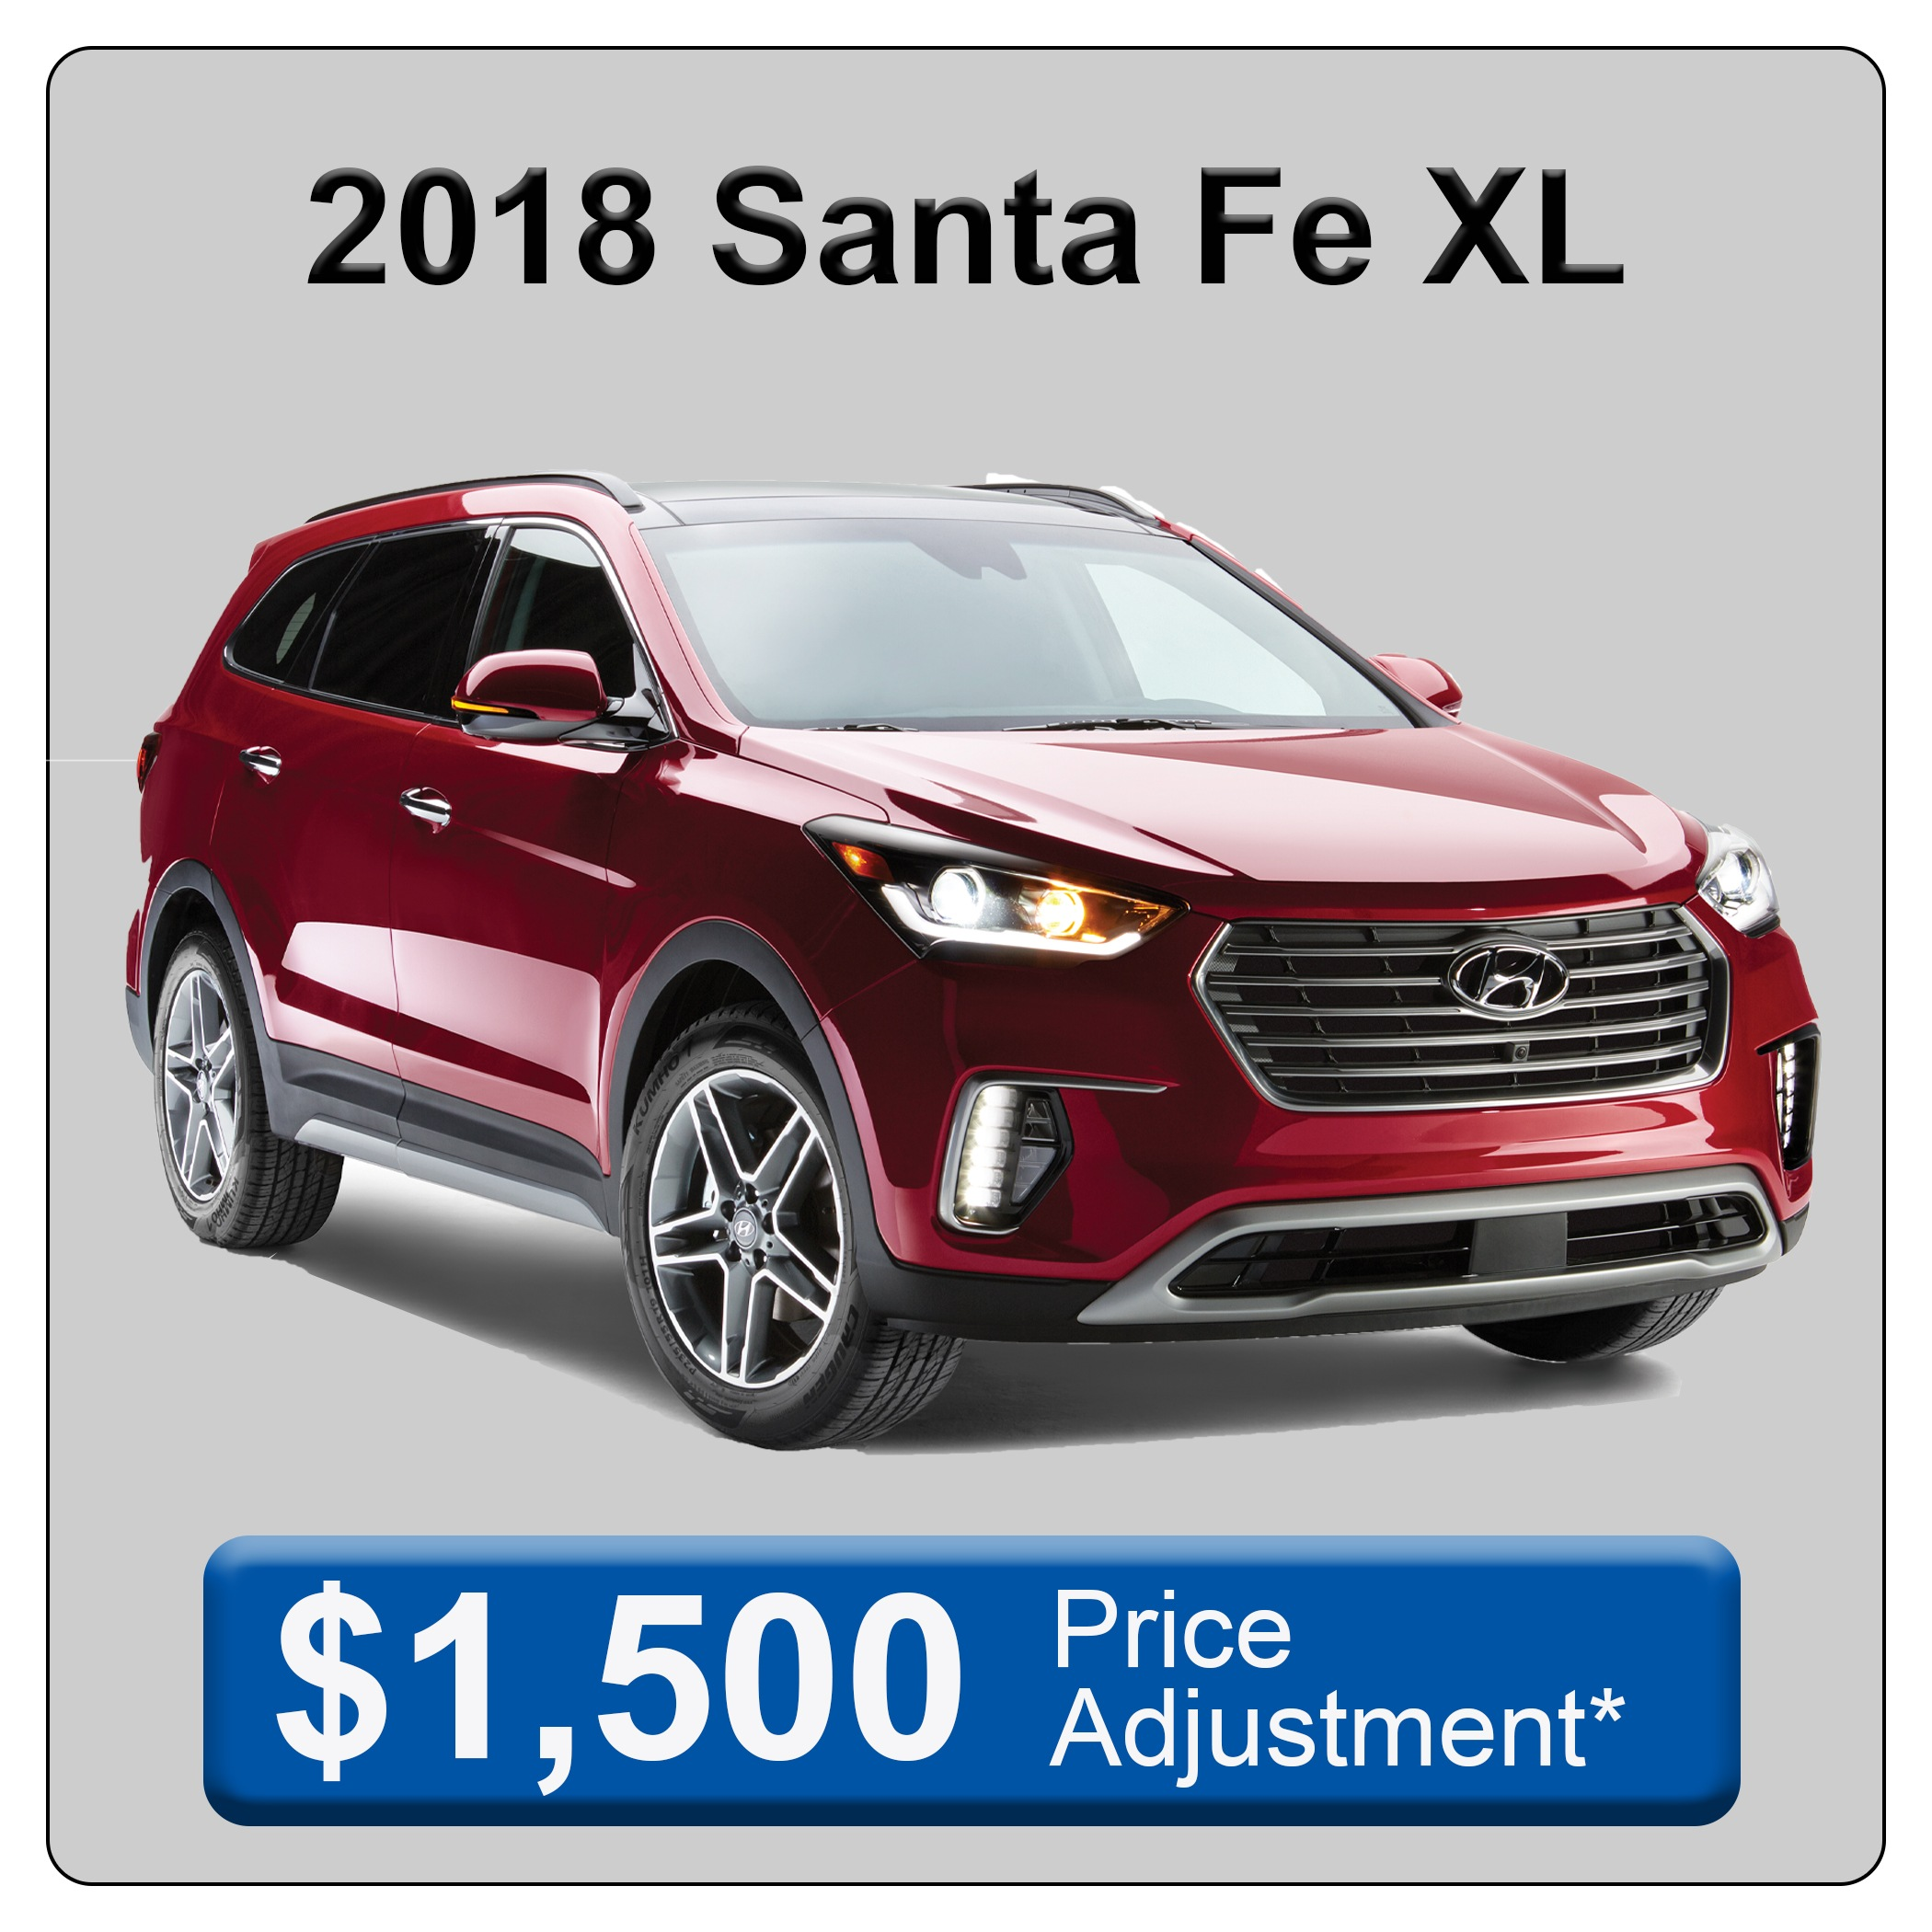 2018 Santa Fe XL